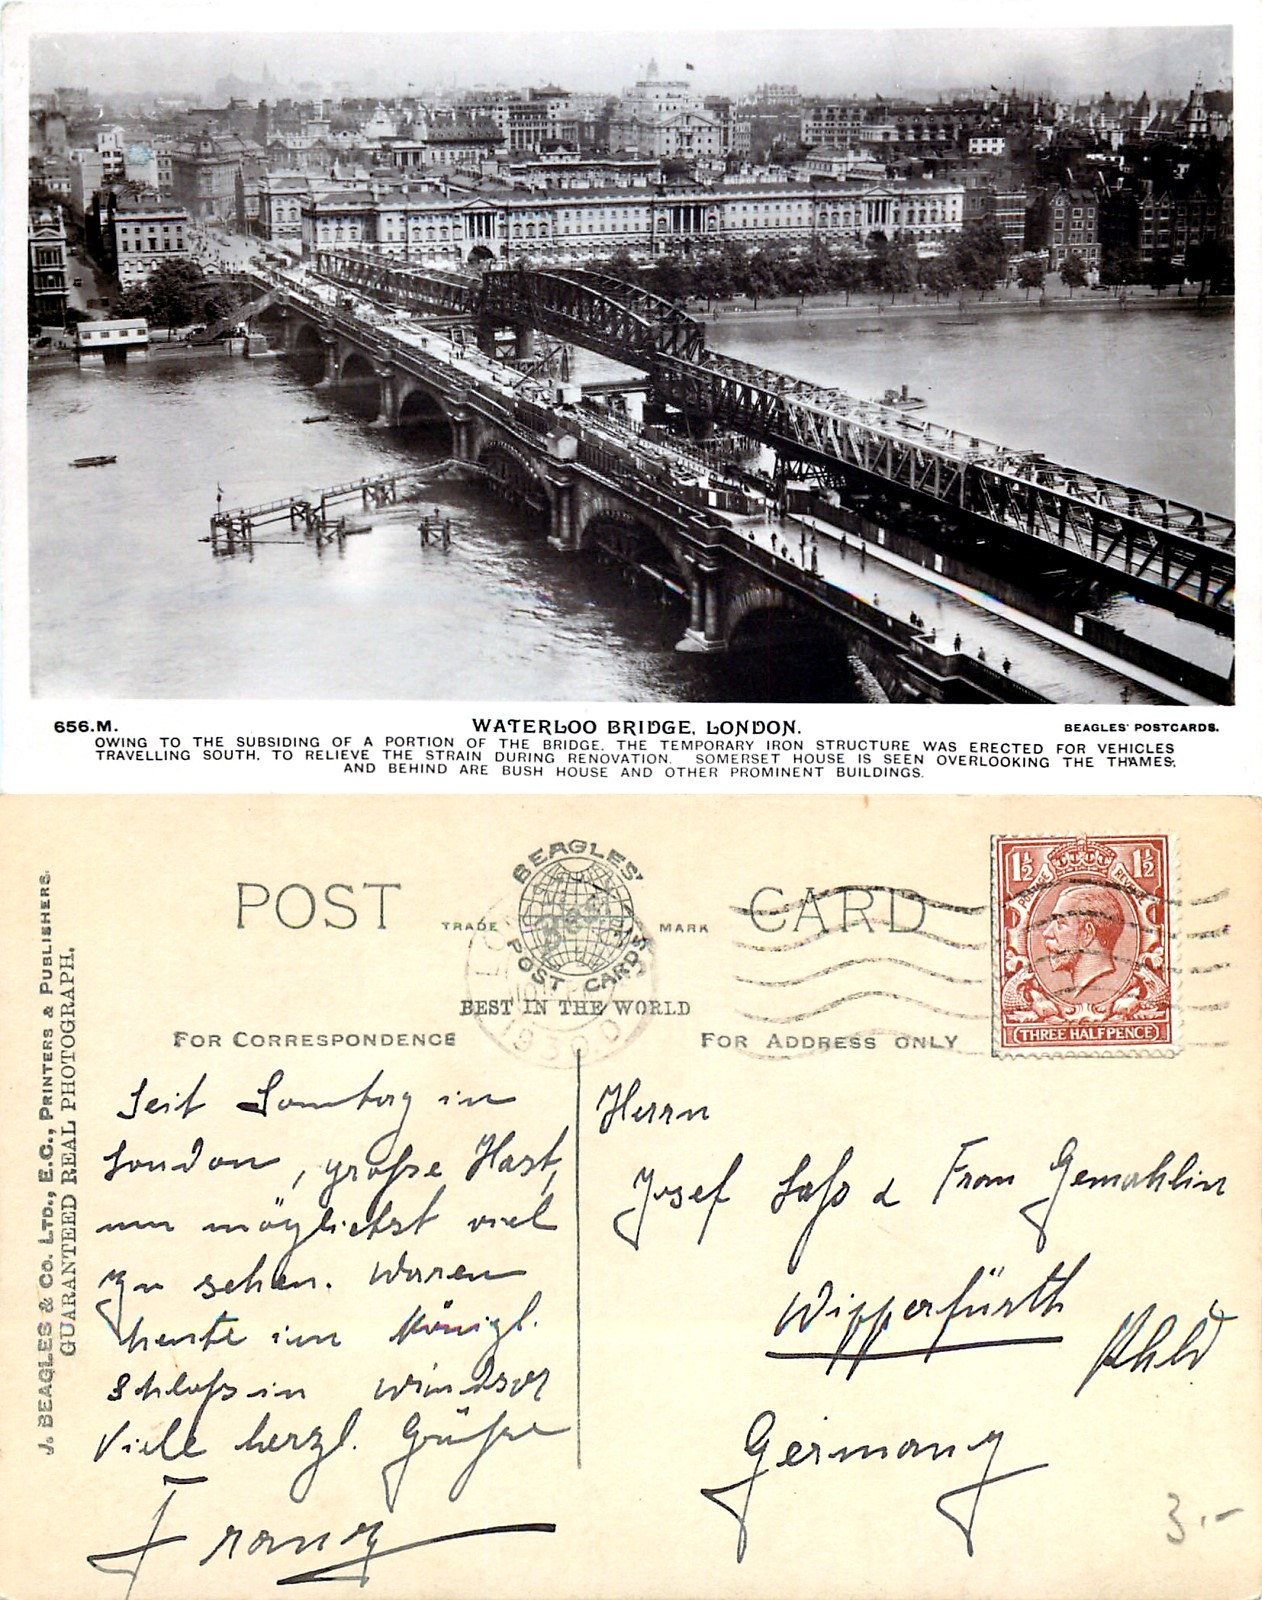 File:Waterloo Bridge, about 1925 02 jpg - Wikimedia Commons